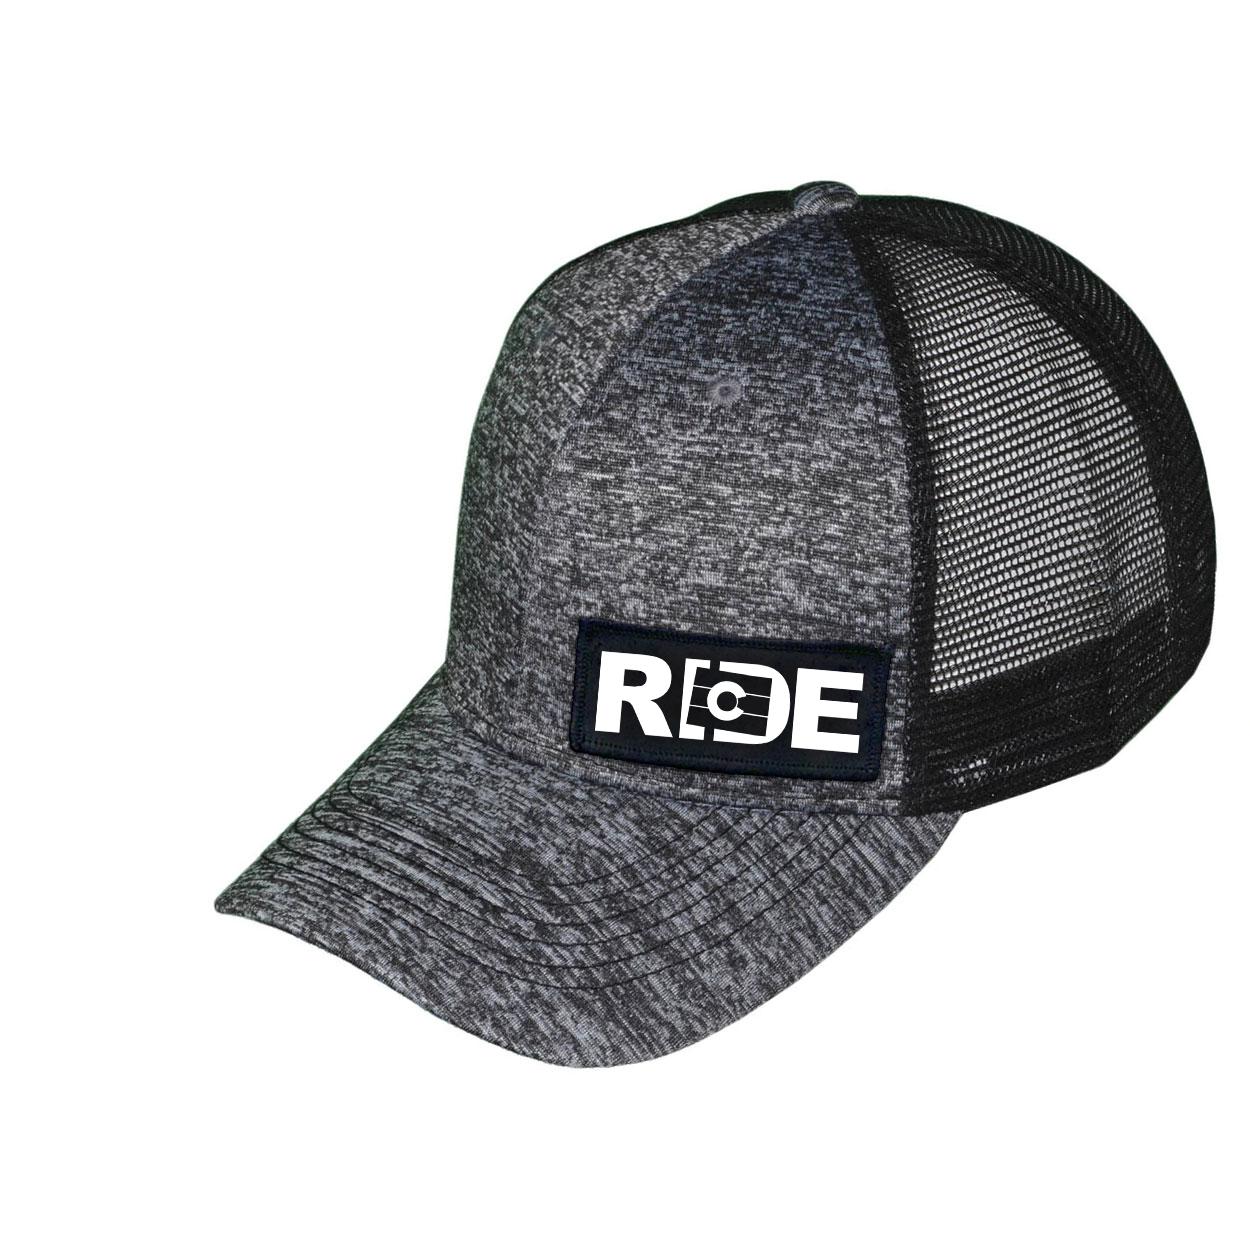 Ride Colorado Night Out Woven Patch Melange Snapback Trucker Hat Gray/Black (White Logo)